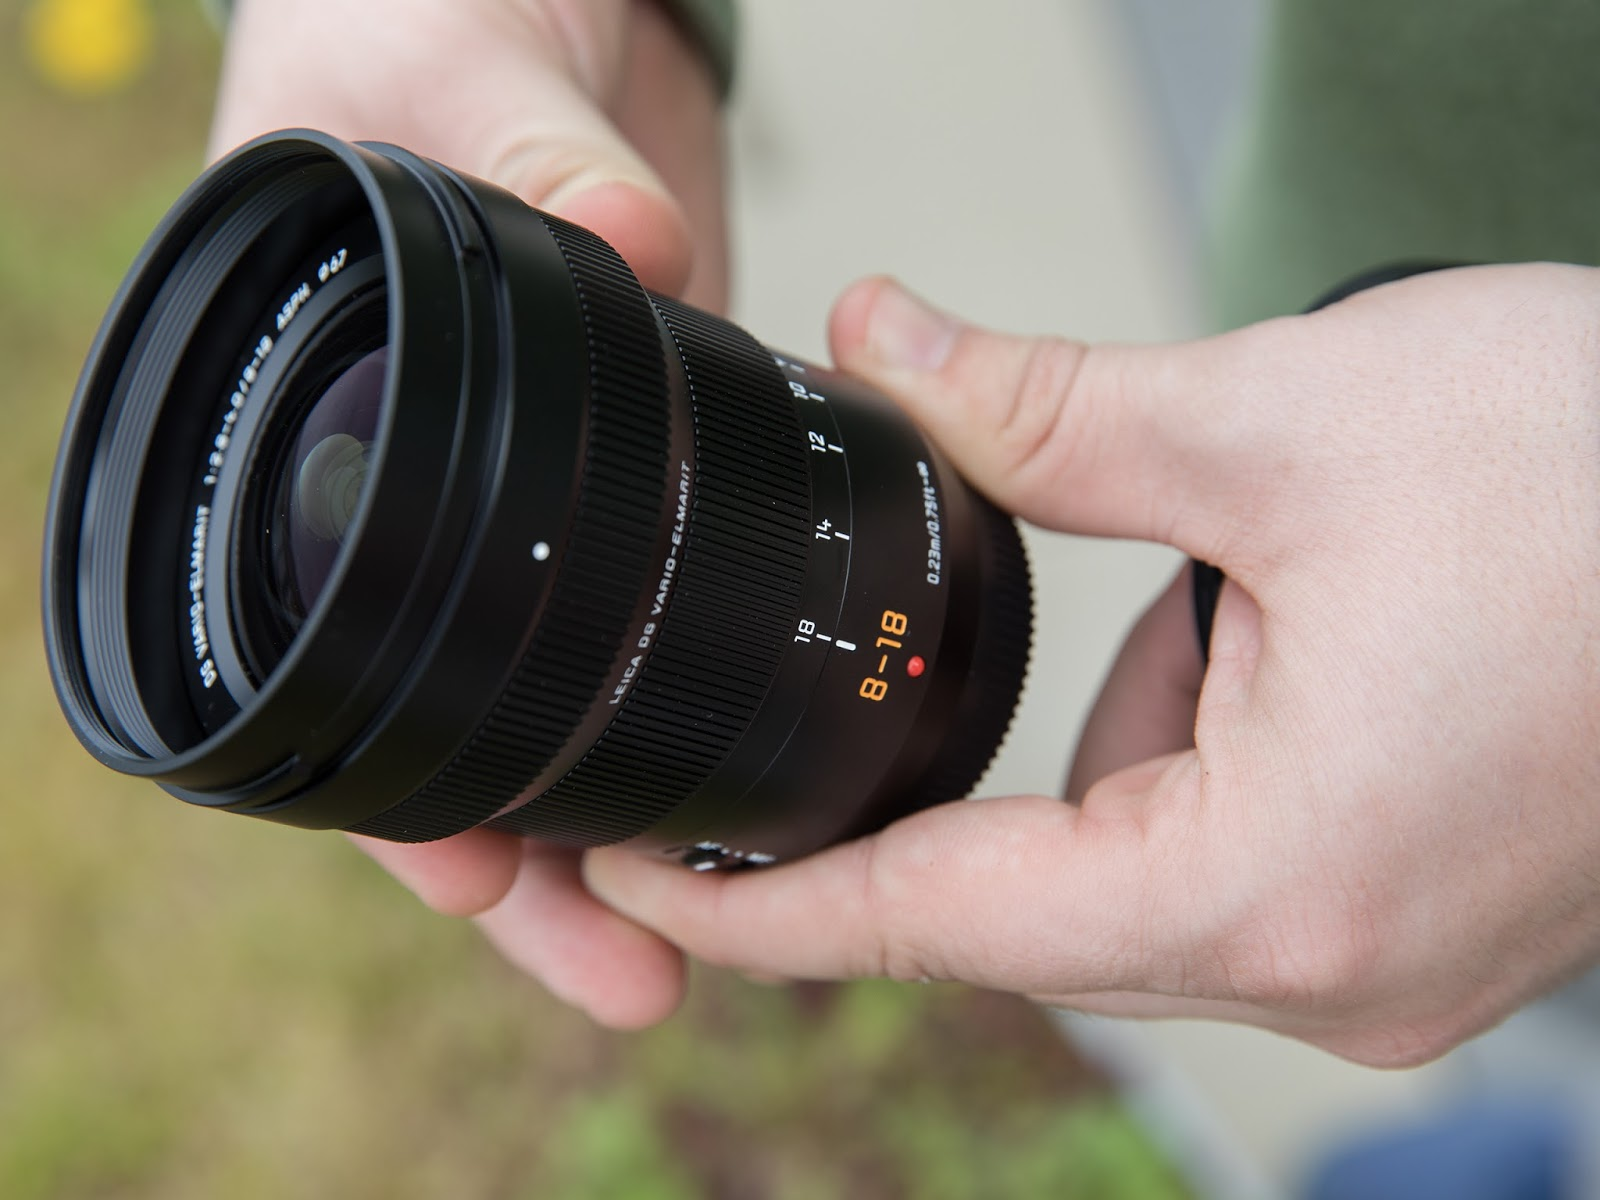 Panasonic Leica DG Vario-Elmarit 8-18mm f/2.8-4 Asph.